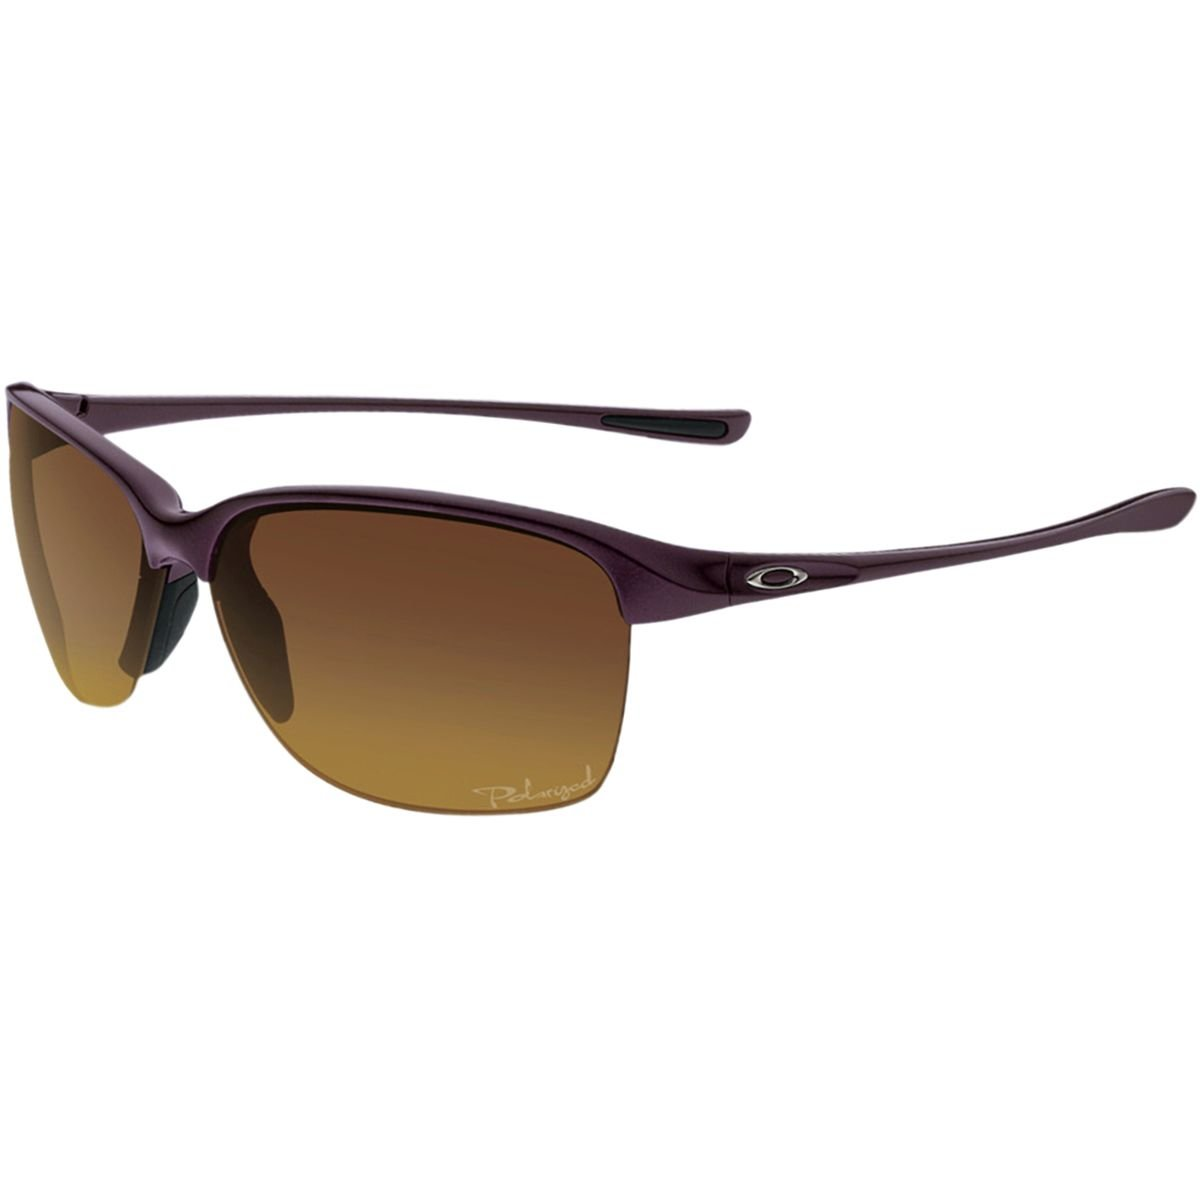 Oakley Unstoppable Polarized Sunglasses - Women's Raspberry Spritzer/Brown Gradient Polar, One Size by Oakley